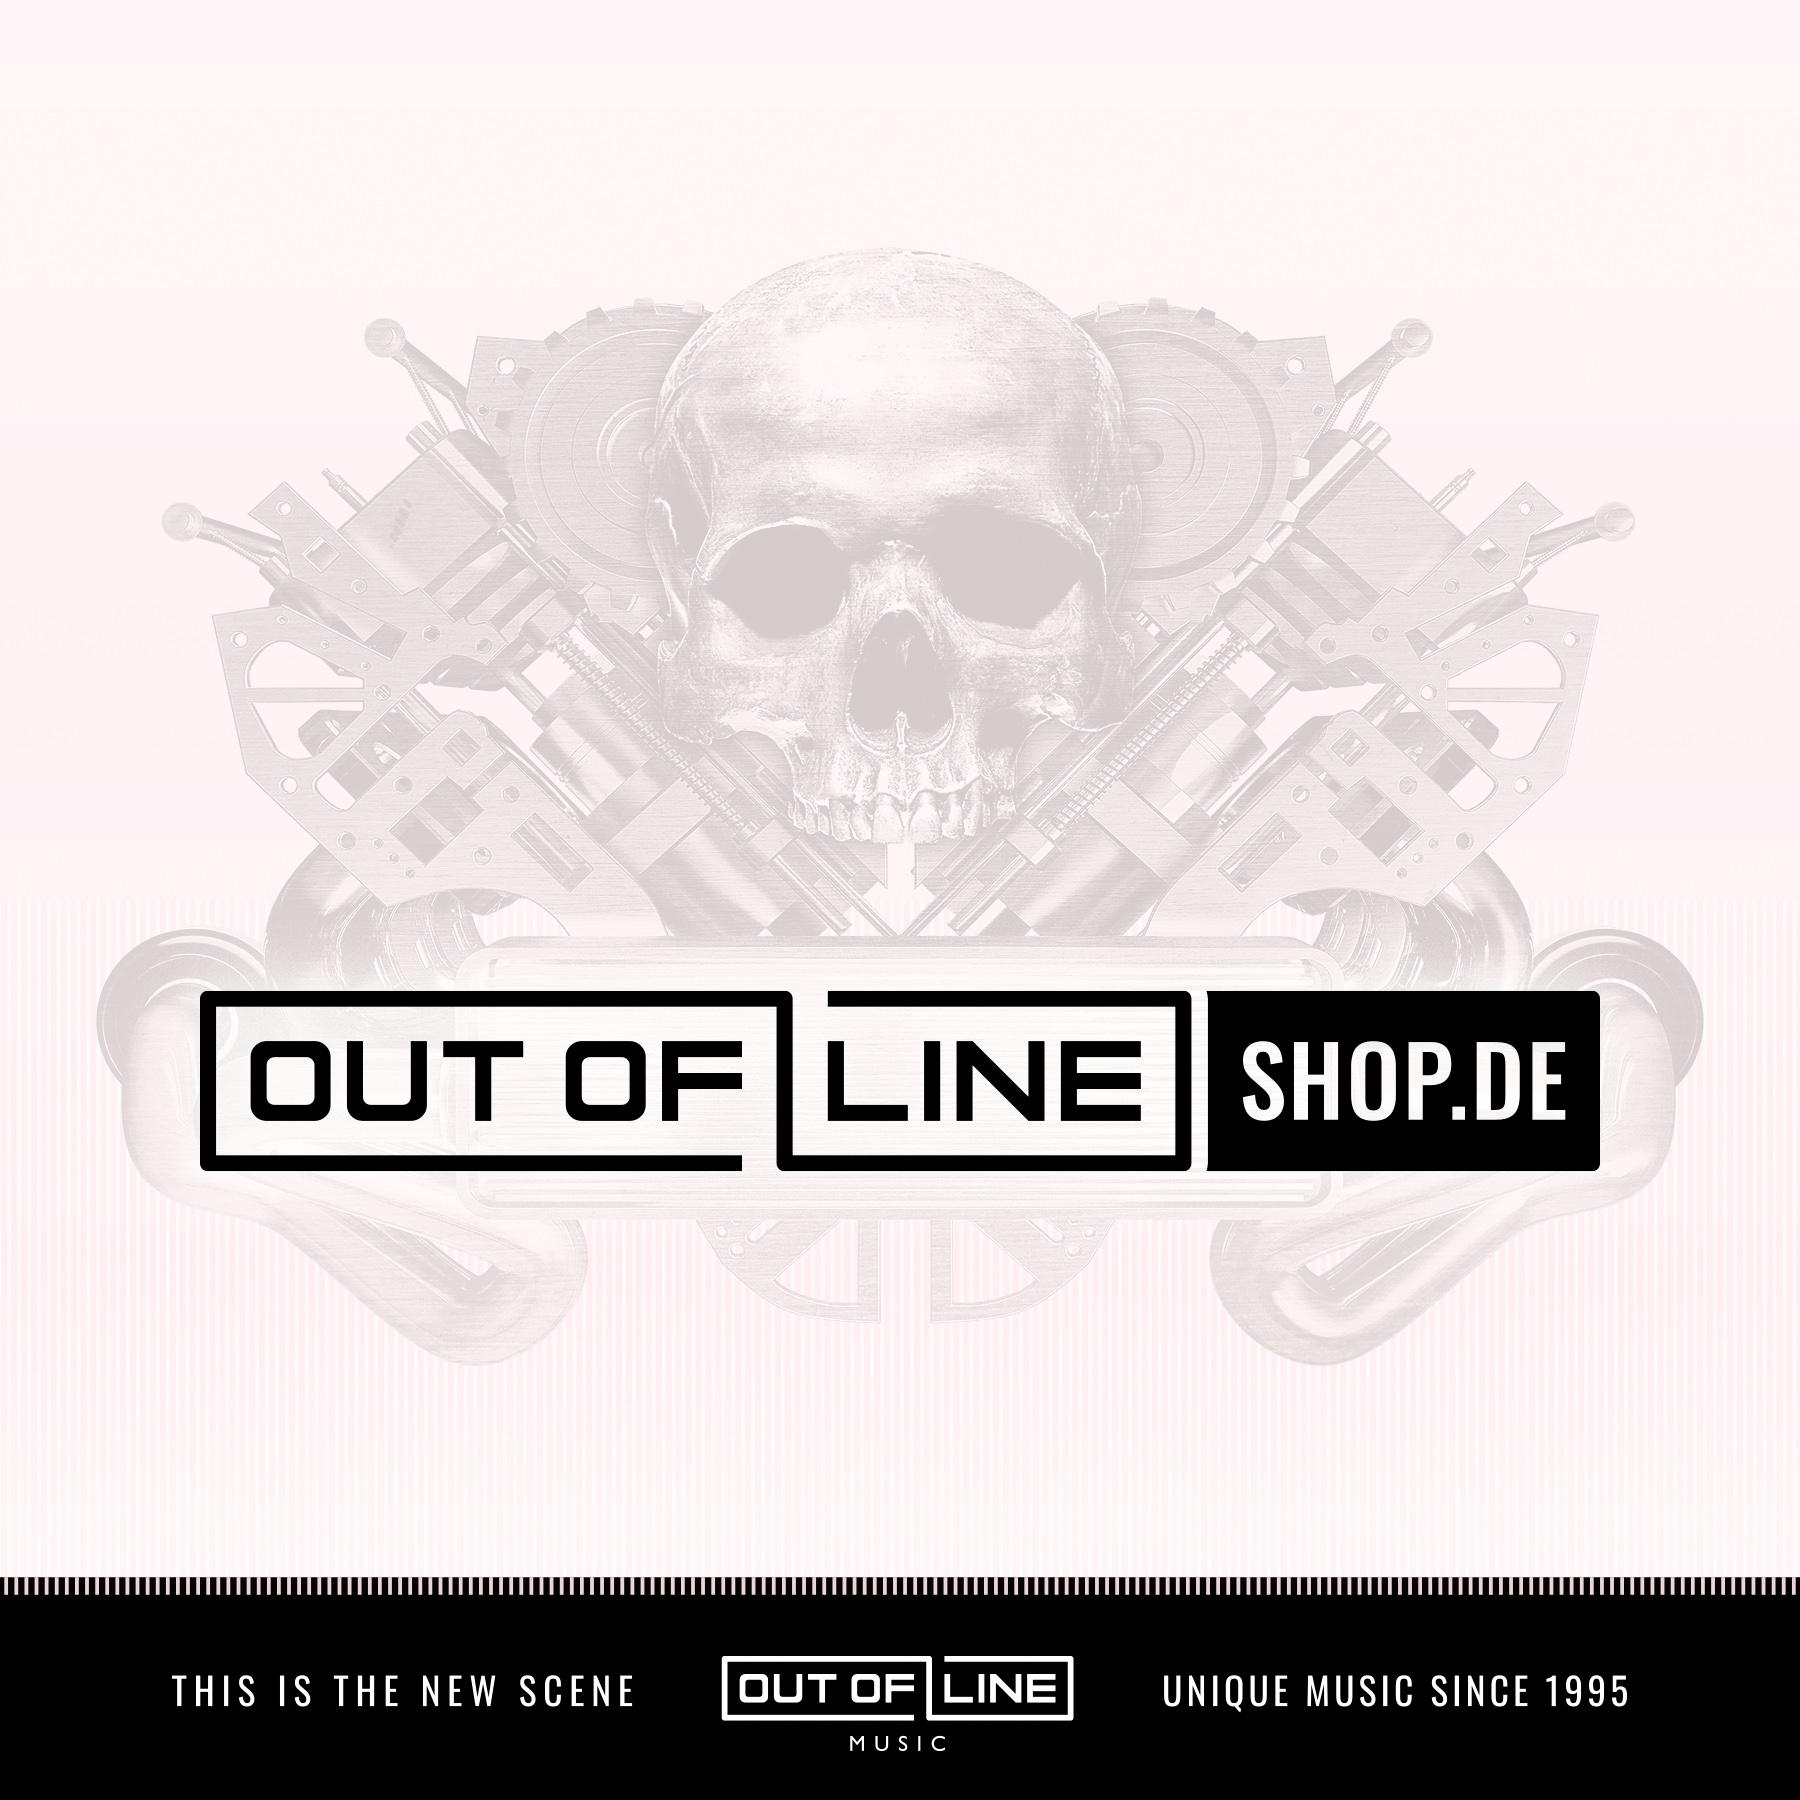 V.A. - Endzeit Bunkertracks [act IV] - CD - 4 CD Box